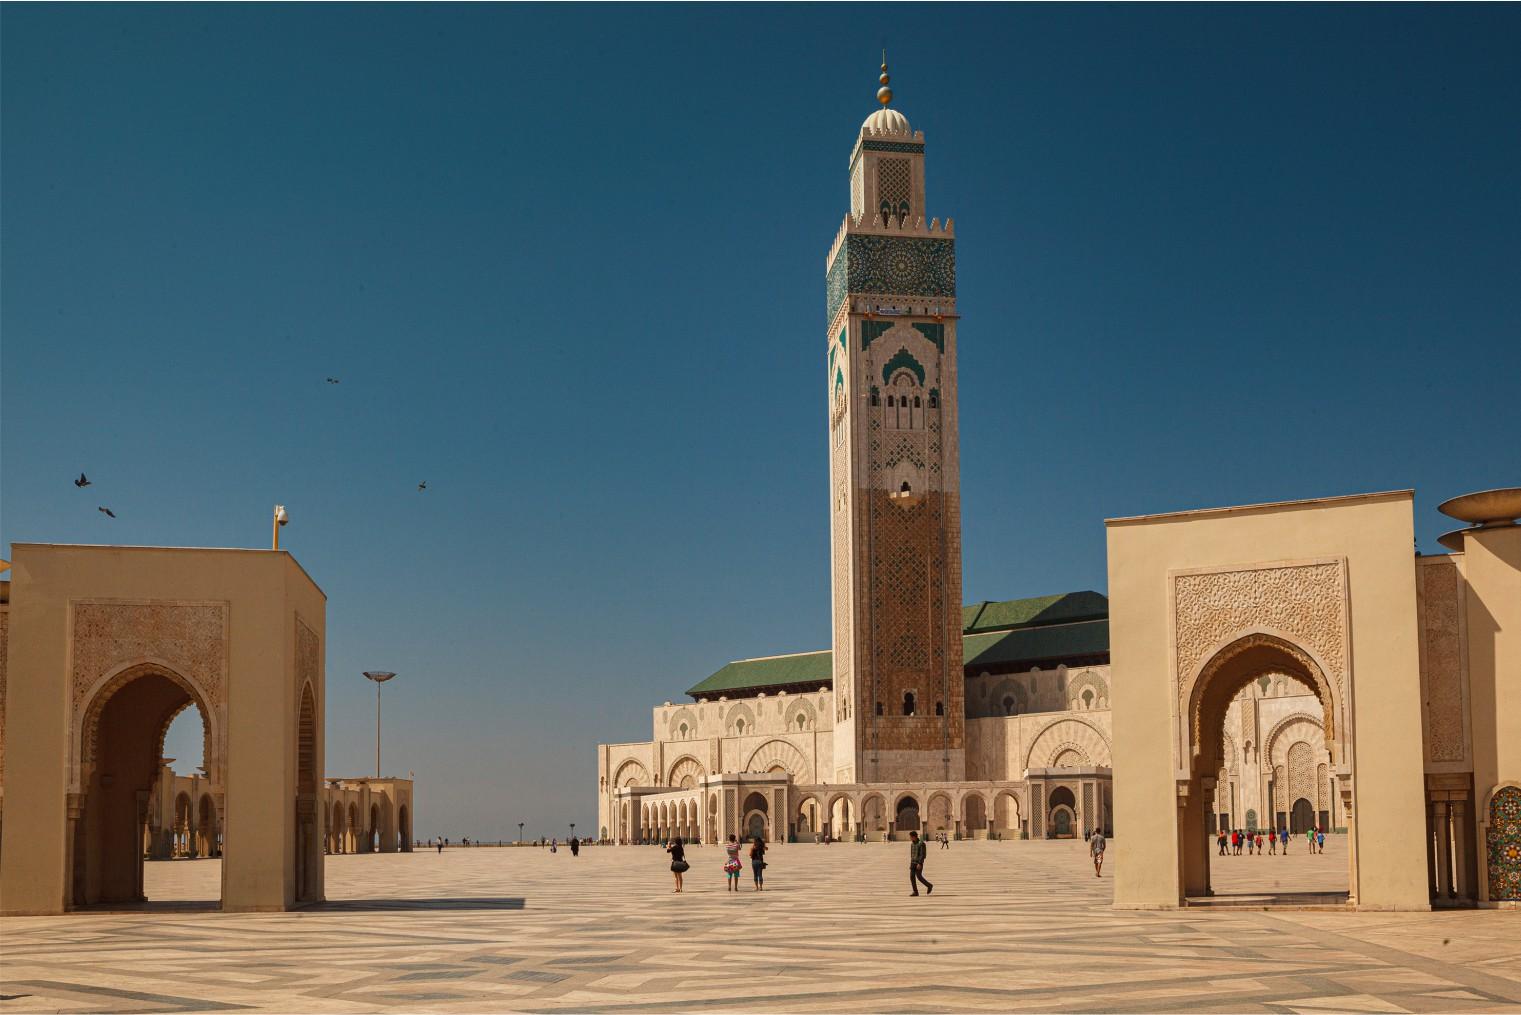 Morocco. Casablanca. Author's tour Sergey Shandin